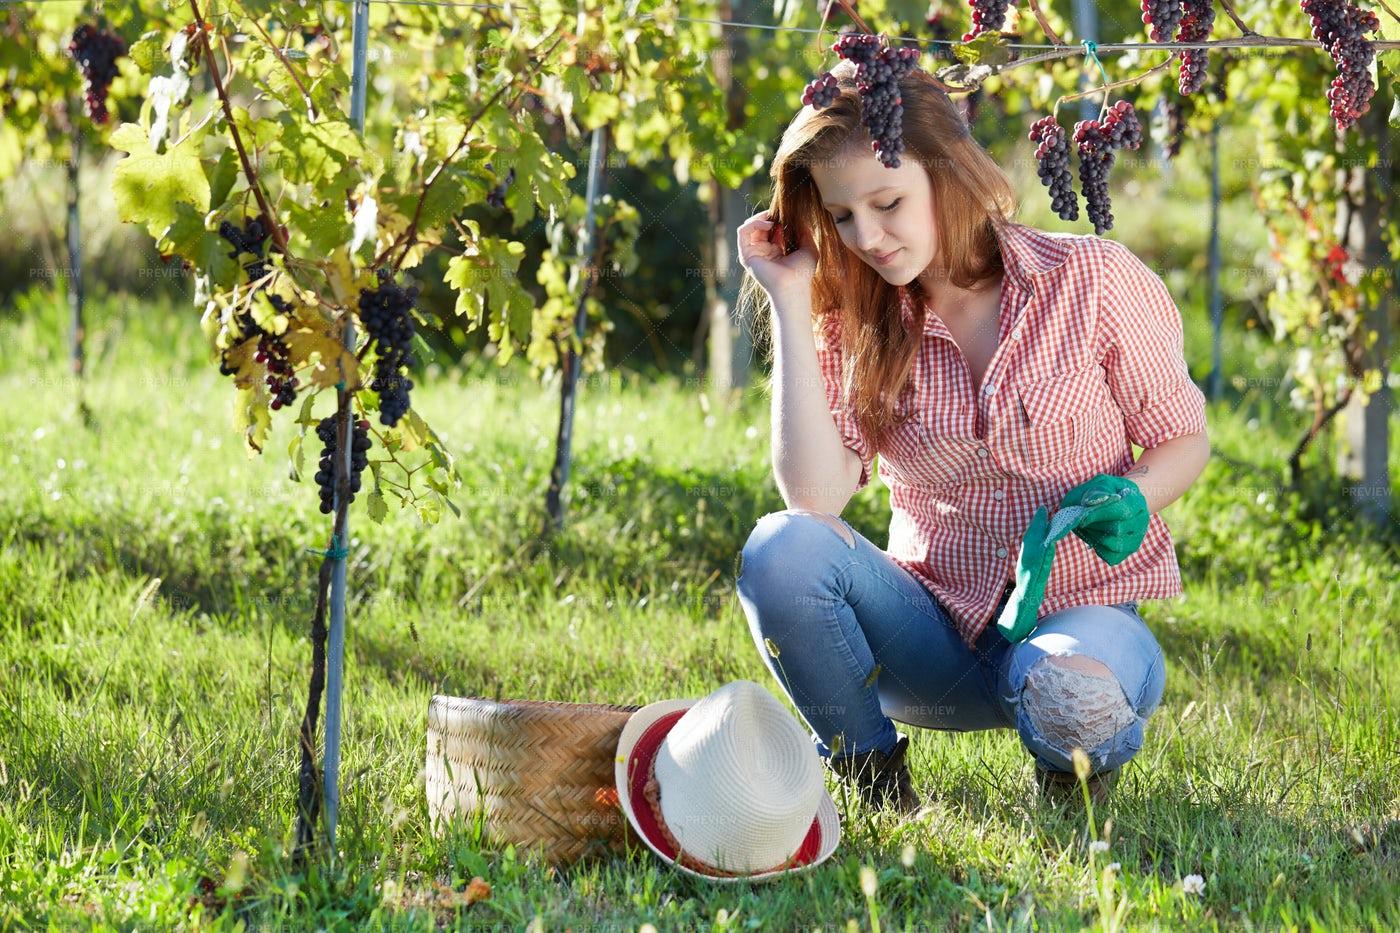 Woman Harvesting Grapes: Stock Photos